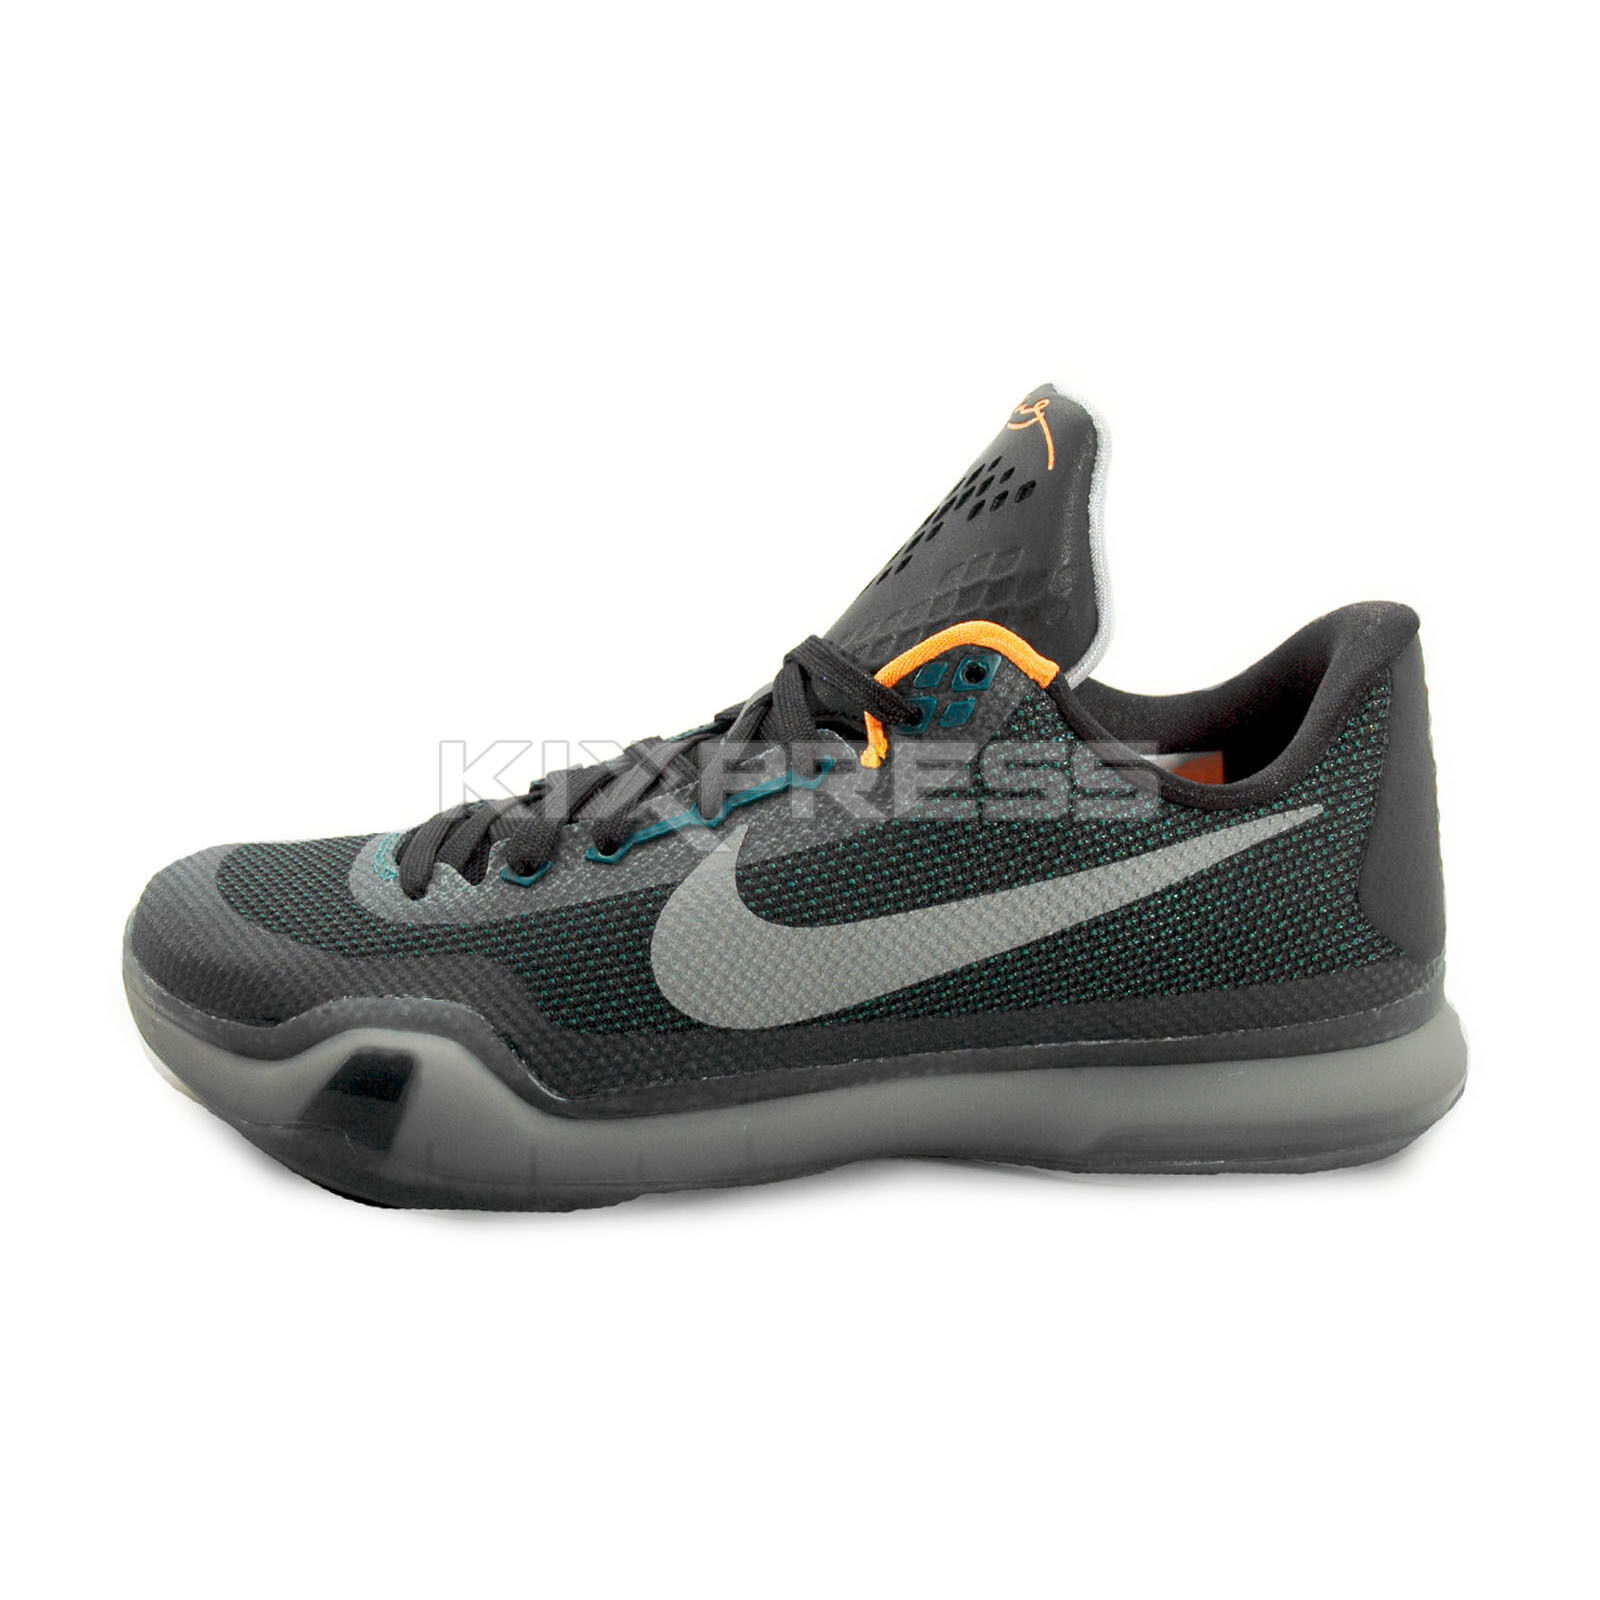 Nike Kobe X EP [745334-308] Basketball Flight Pack Teal/Silver-Black-Grey